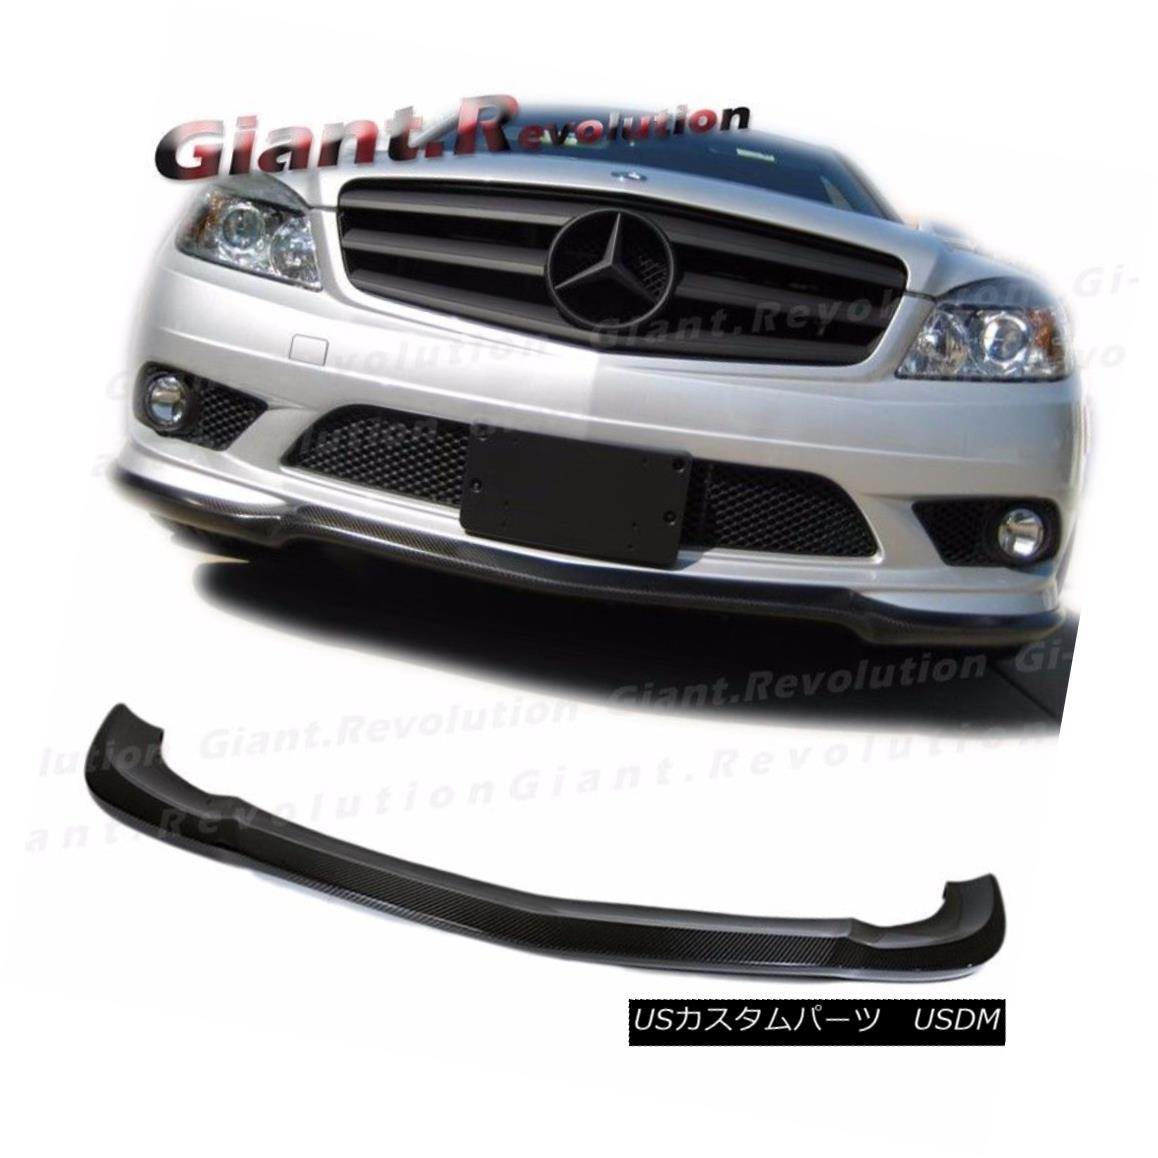 Mercedes-BENZ Carbon Fiber Rear Bumper Splitter Lip For W204 C-Class Sedan 08-11